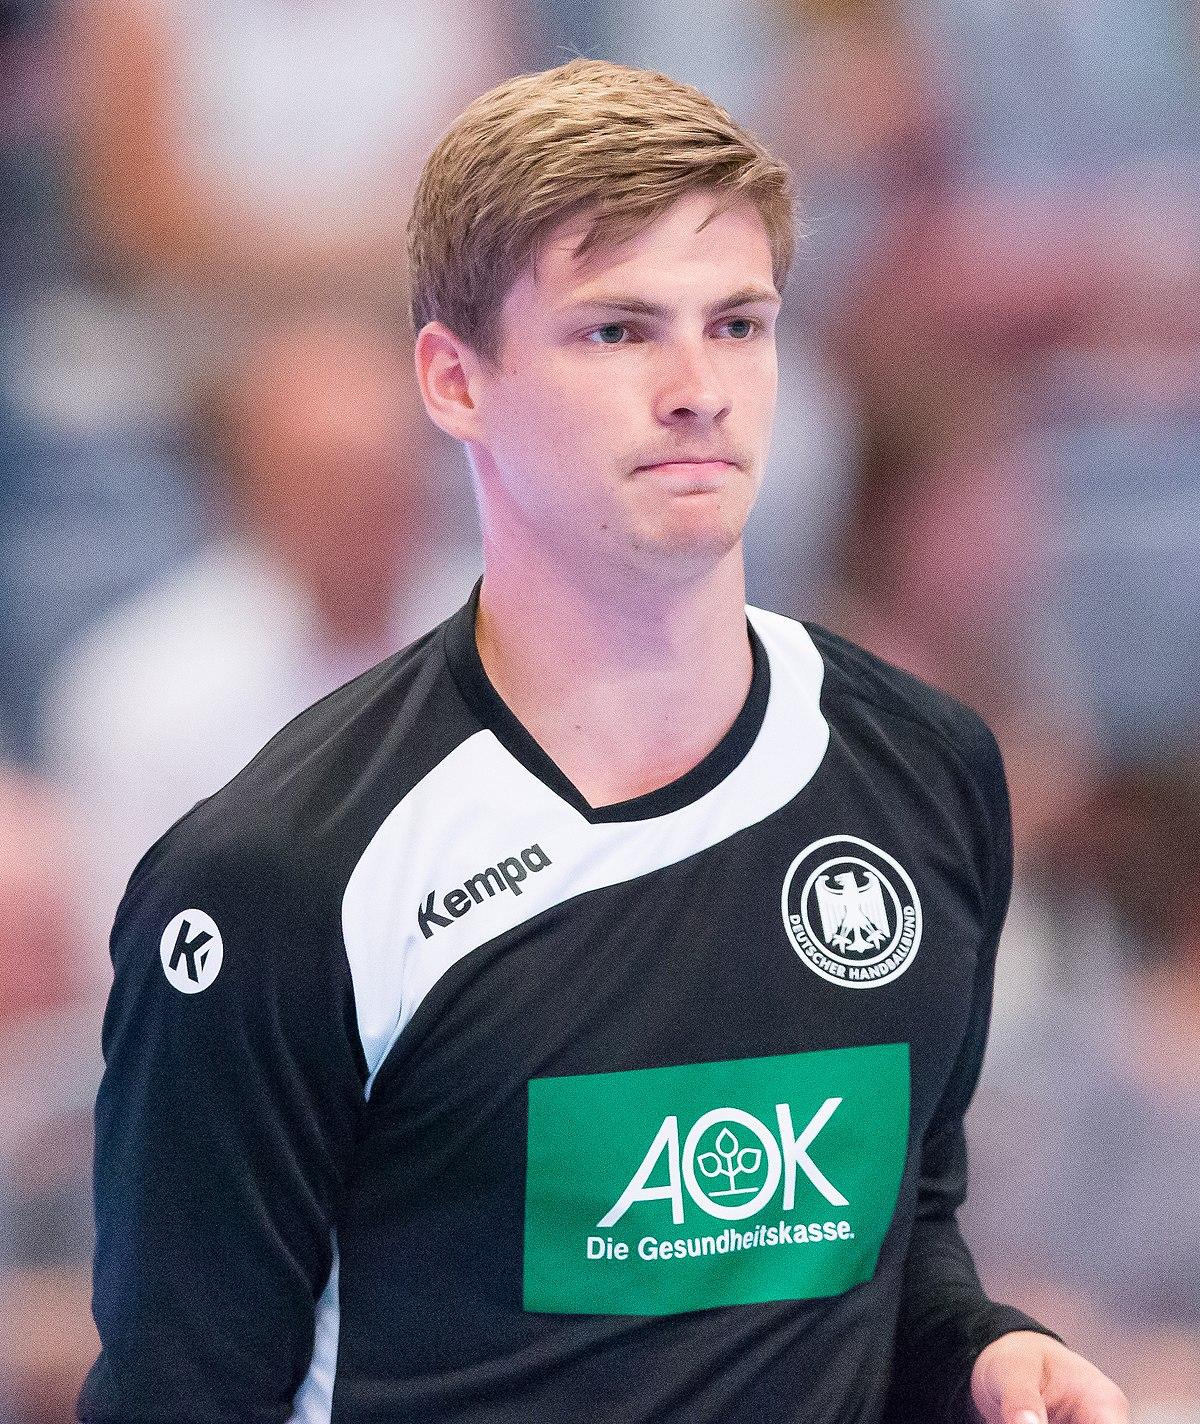 Dkb We Have A Stream: DKB Handball Bundesliga